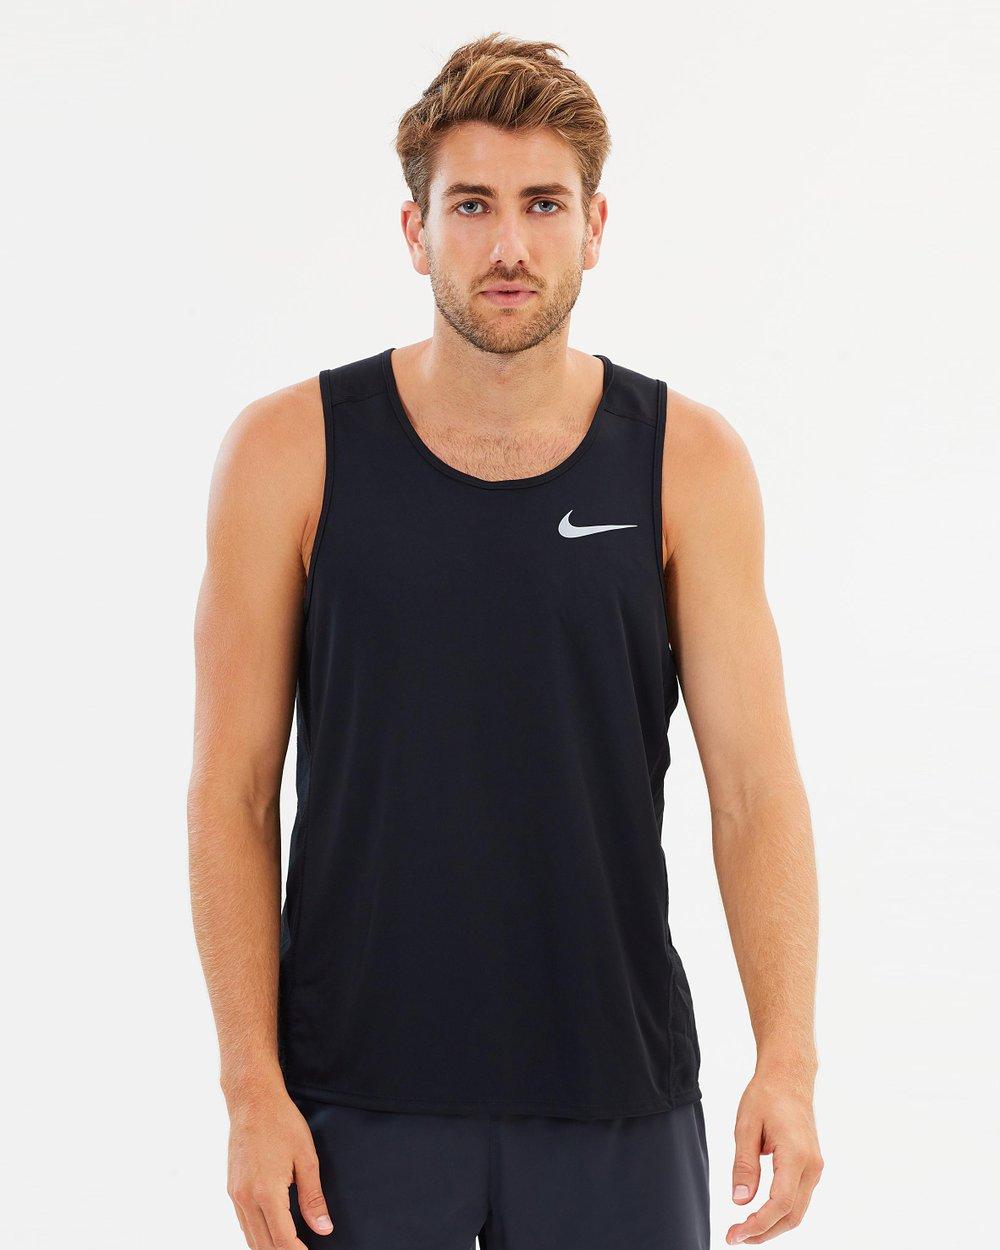 09a4d0c2e0f547 Men s Nike Miler Running Tank by Nike Online